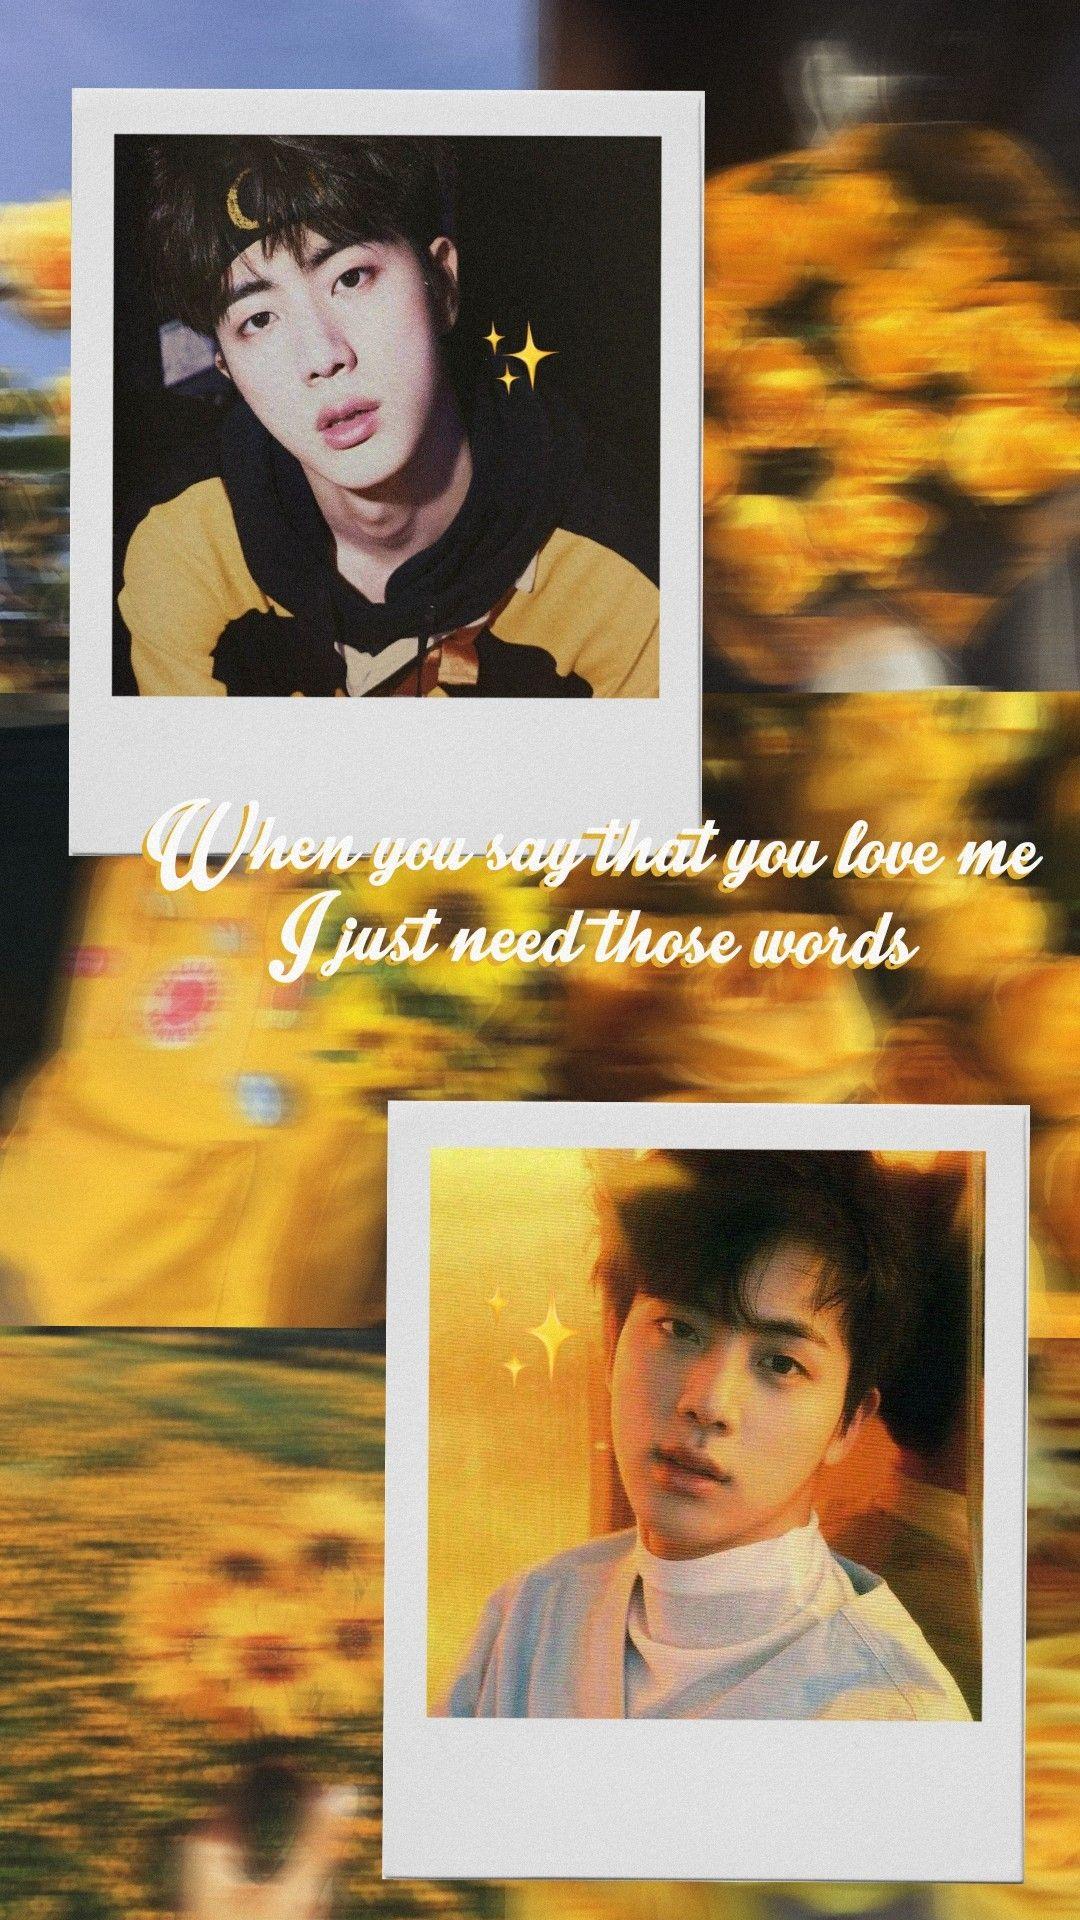 Seokjin Wallpaper Iphone Quotes Backgrounds Bts Wallpaper Tumblr Yellow